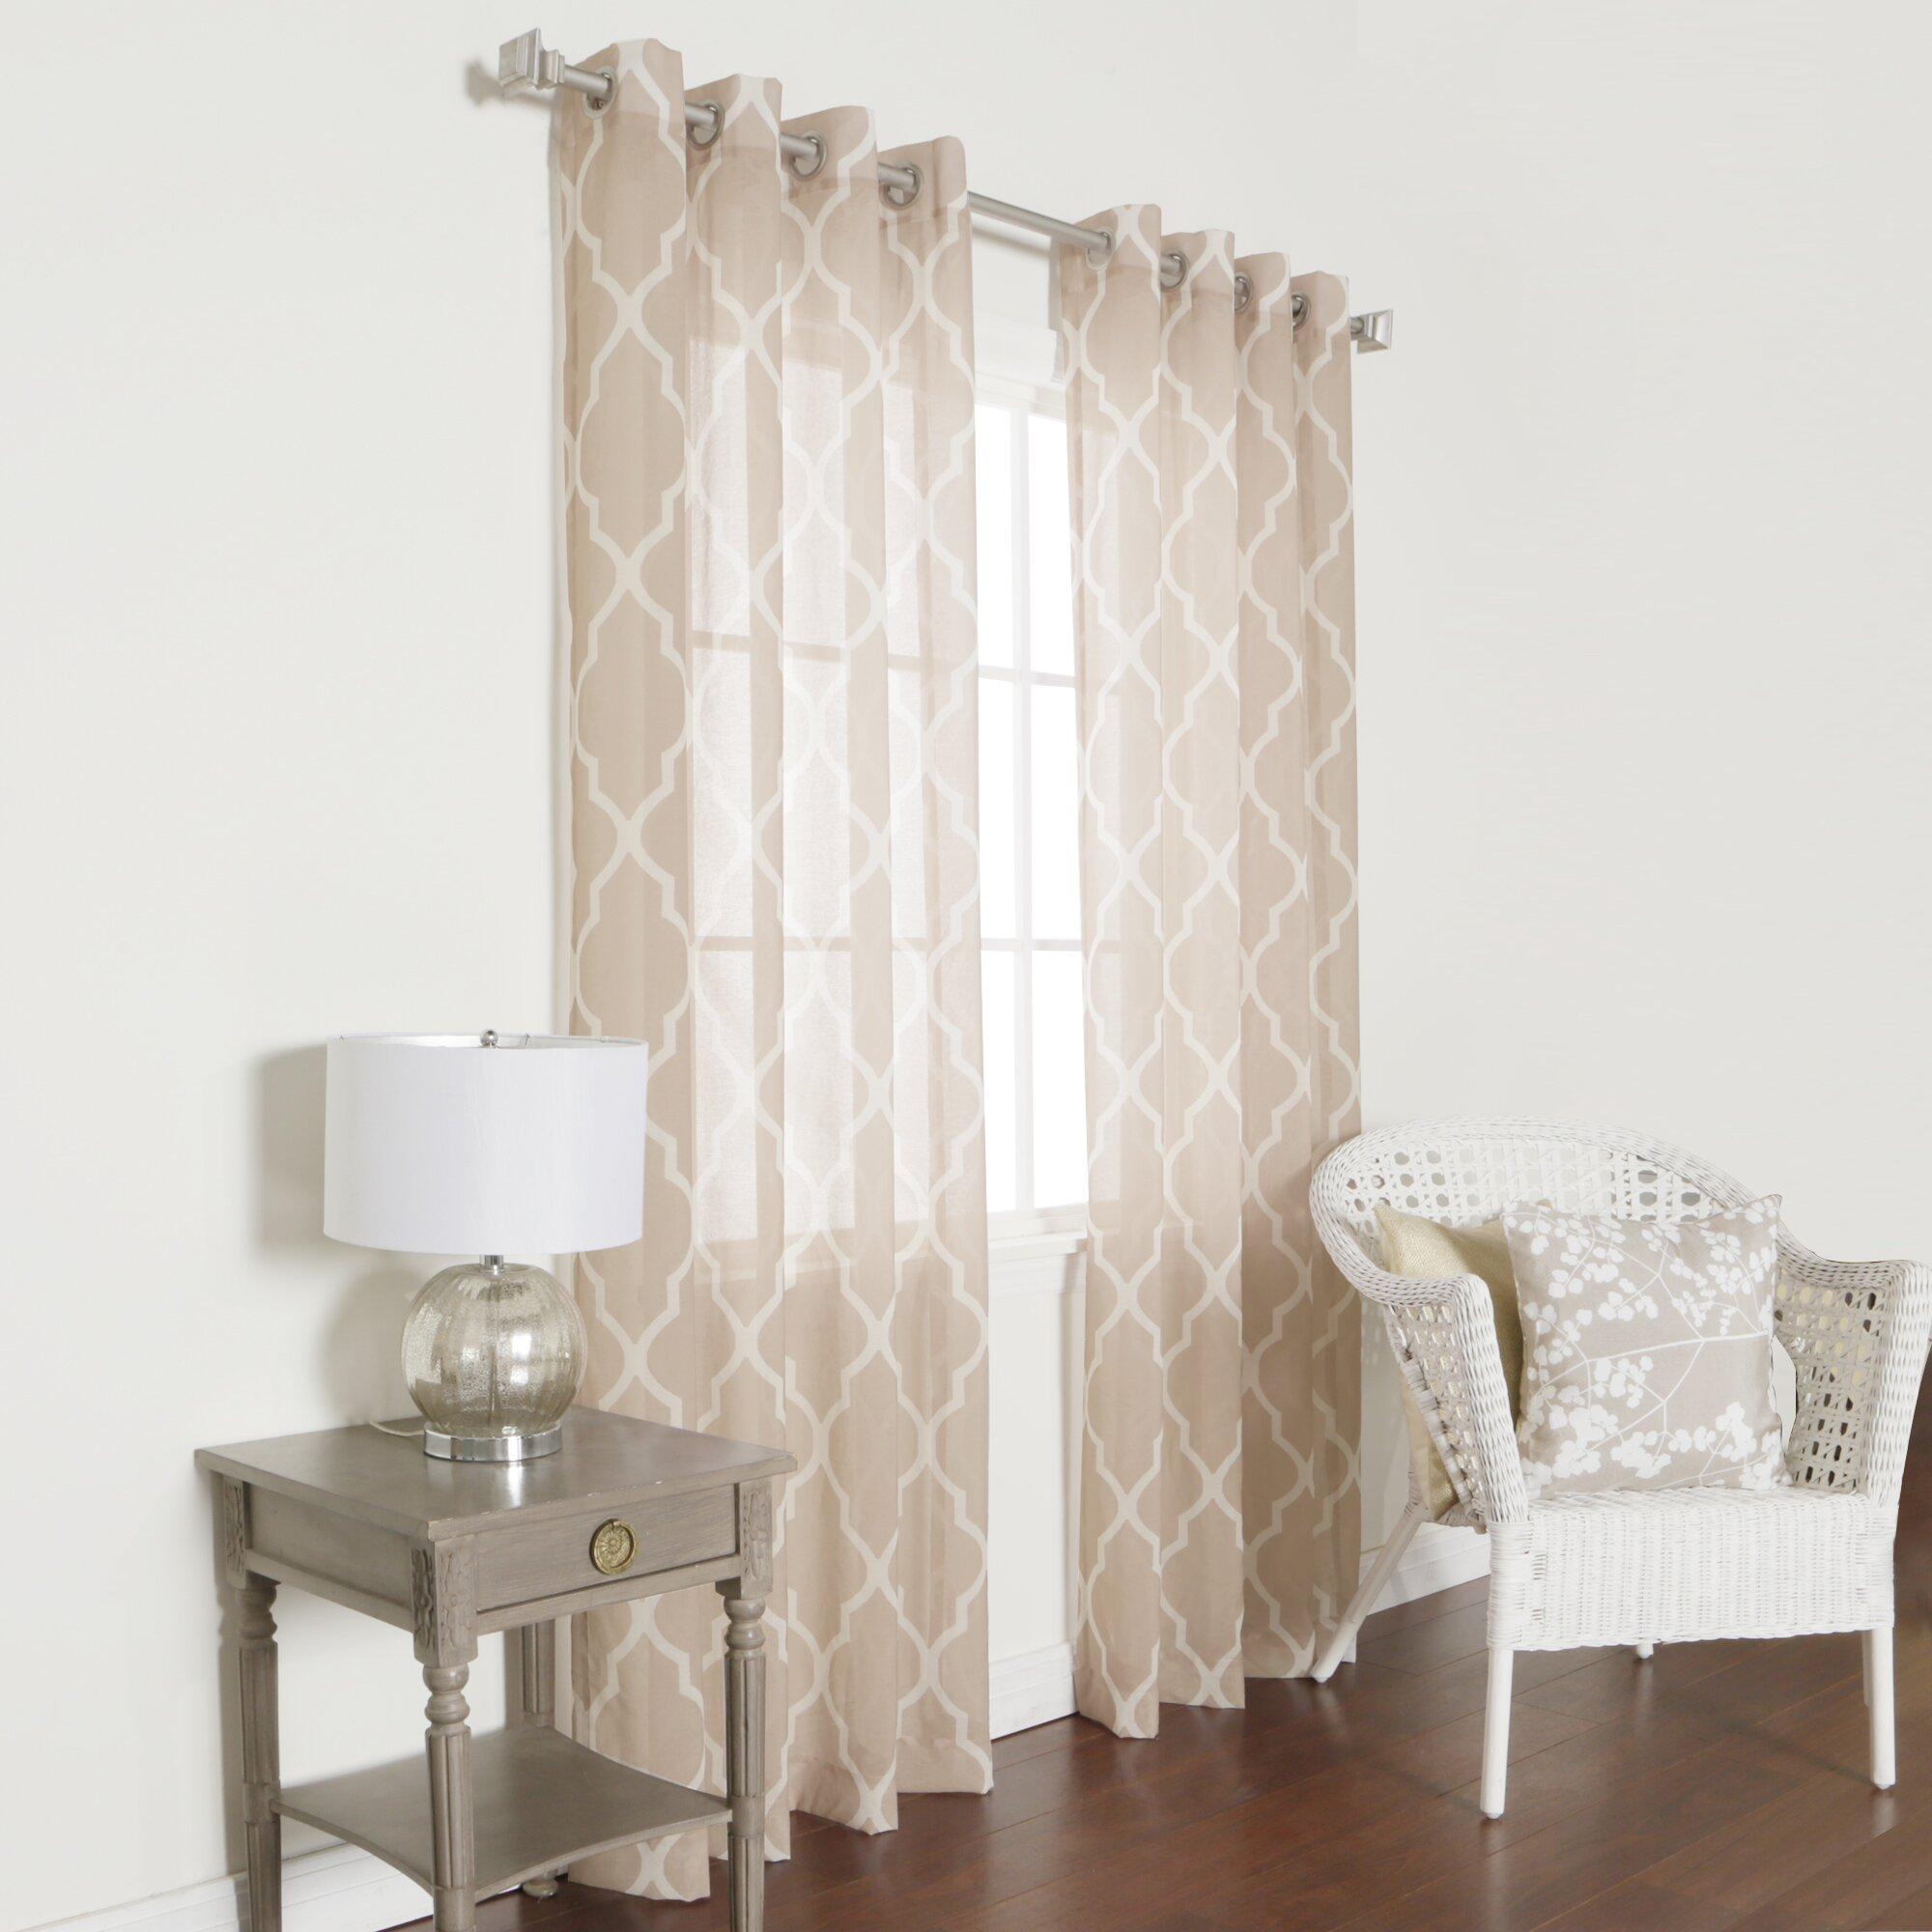 Sheer Cheetah Print Curtains - Best home fashion inc moroccan grommet top sheer curtain panels